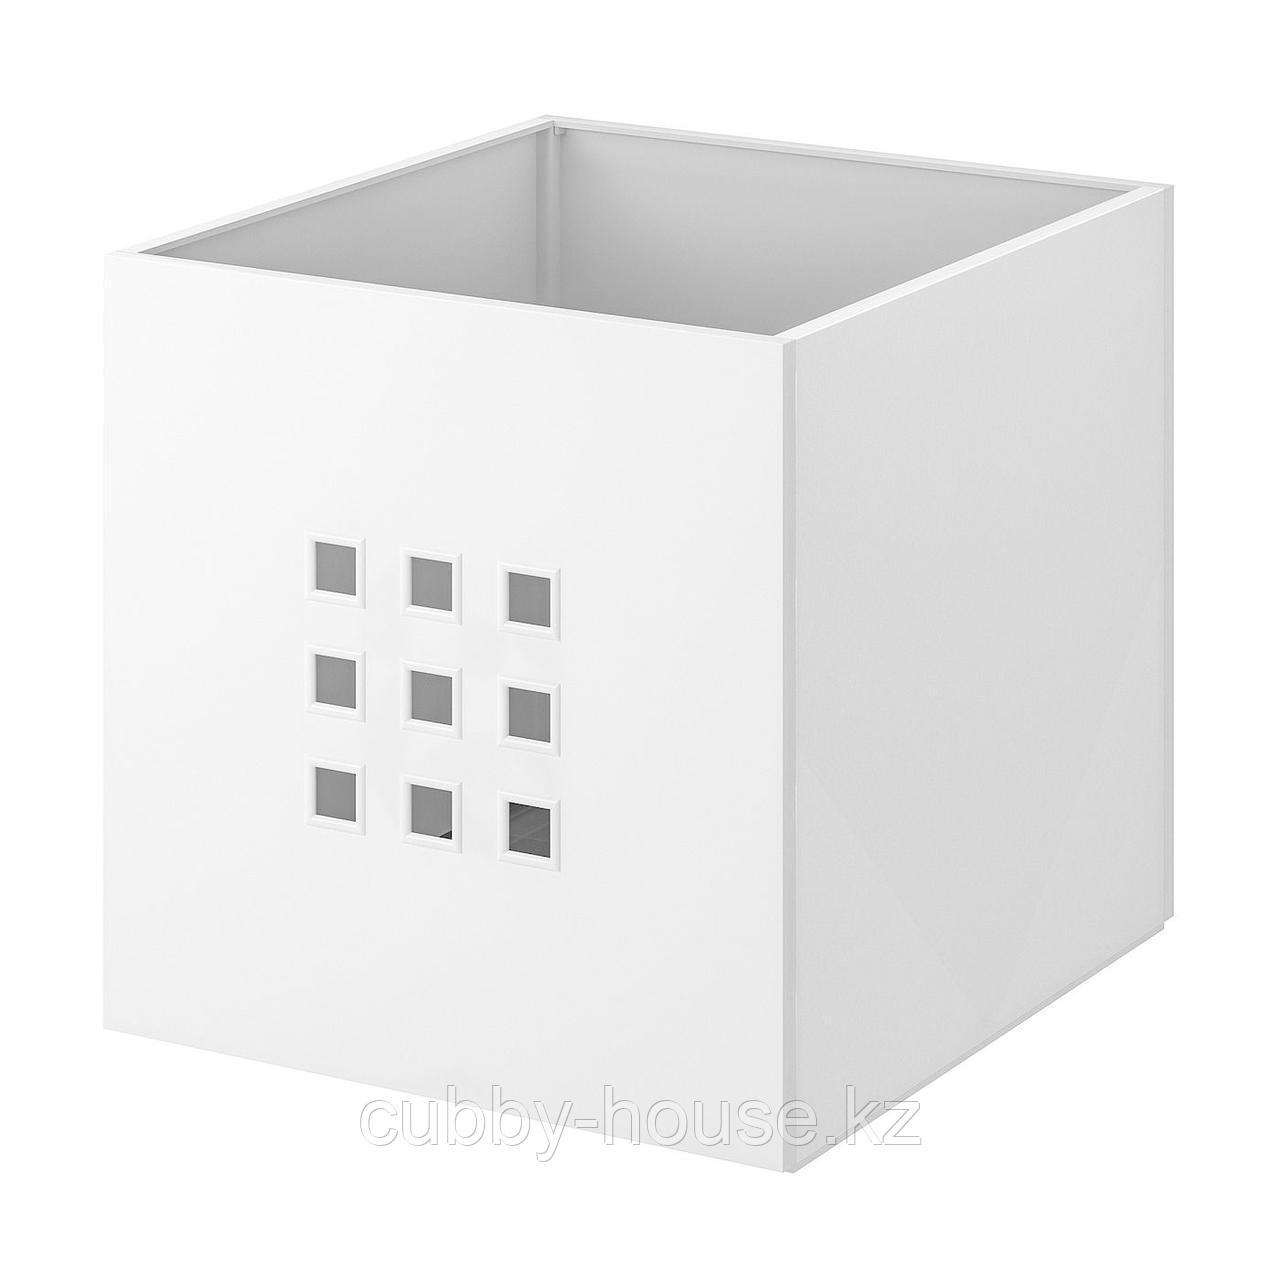 ЛЕКМАН Контейнер, белый, 33x37x33 см